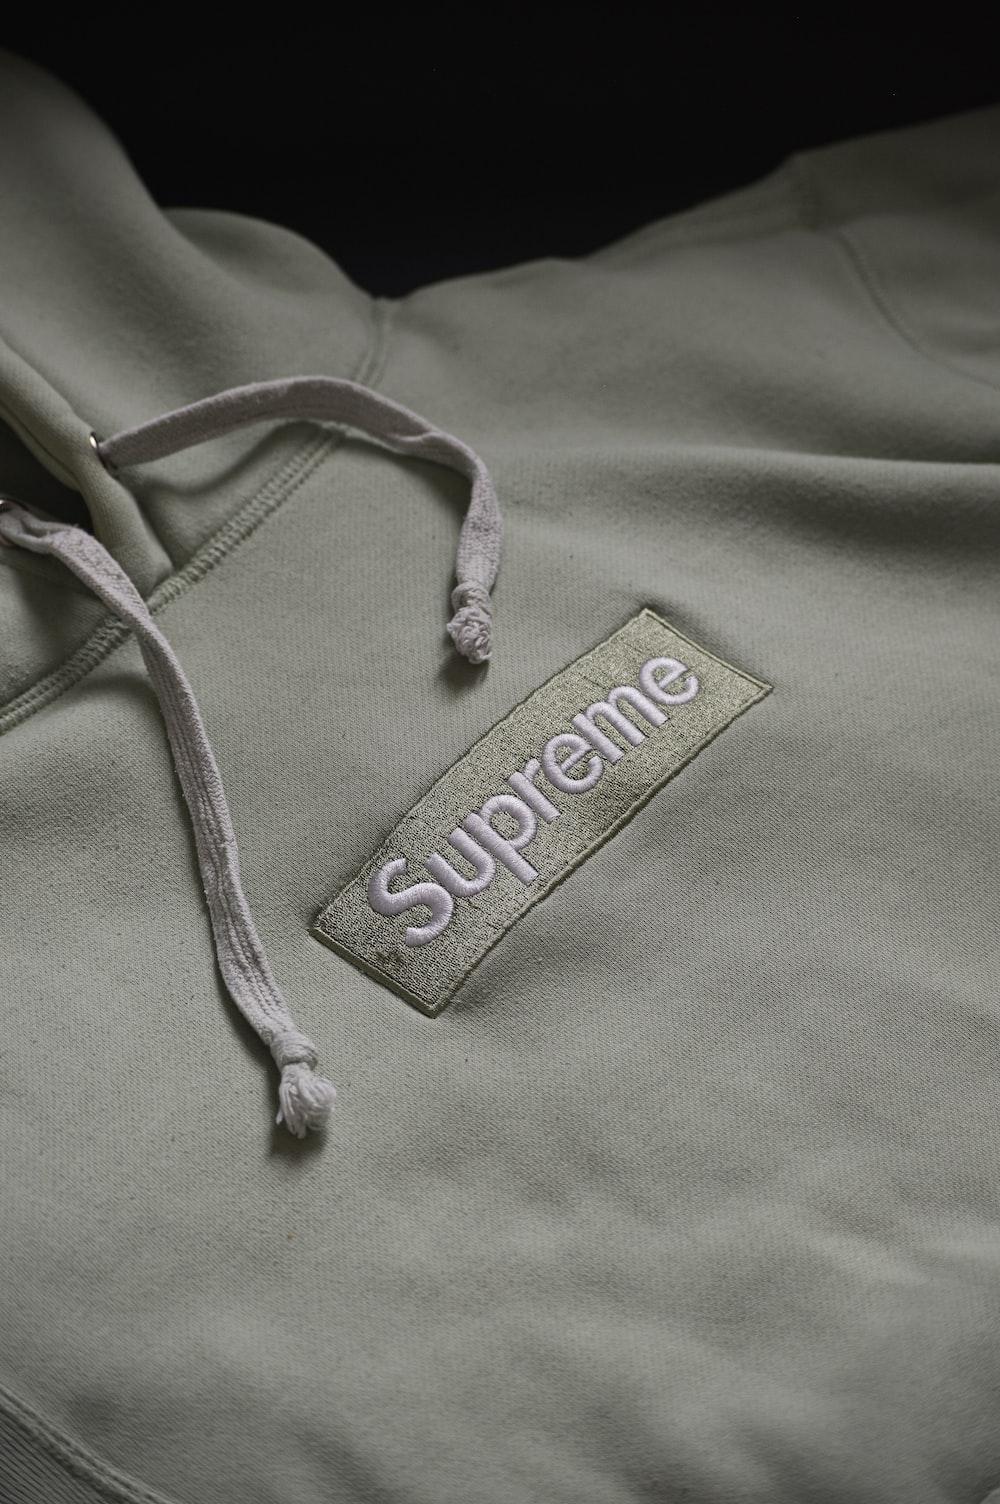 gray and white adidas shirt